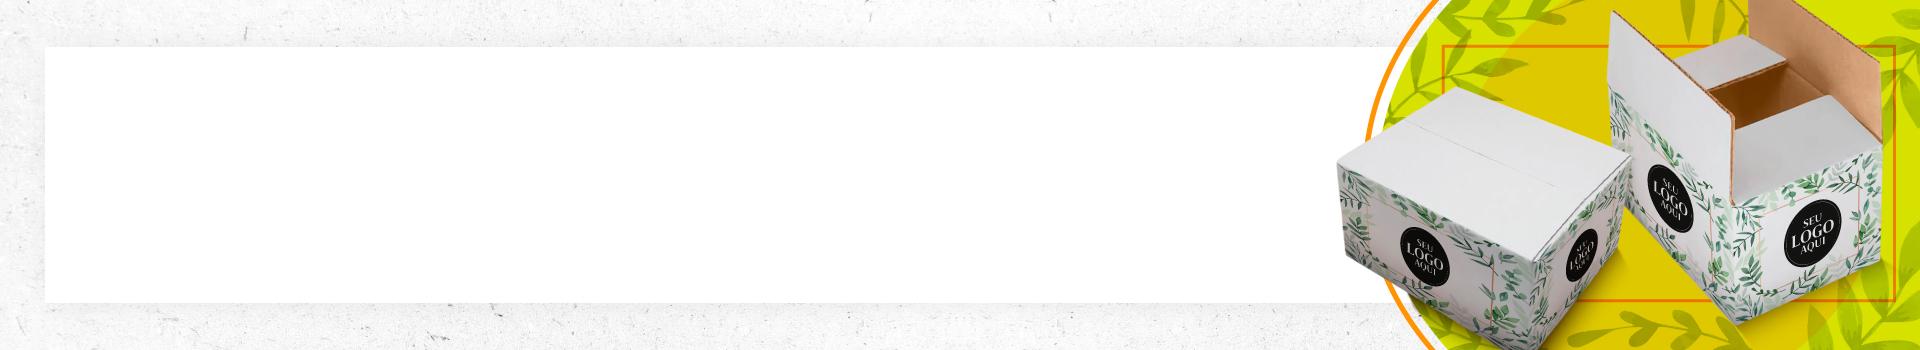 Caixa Personalizada Branca